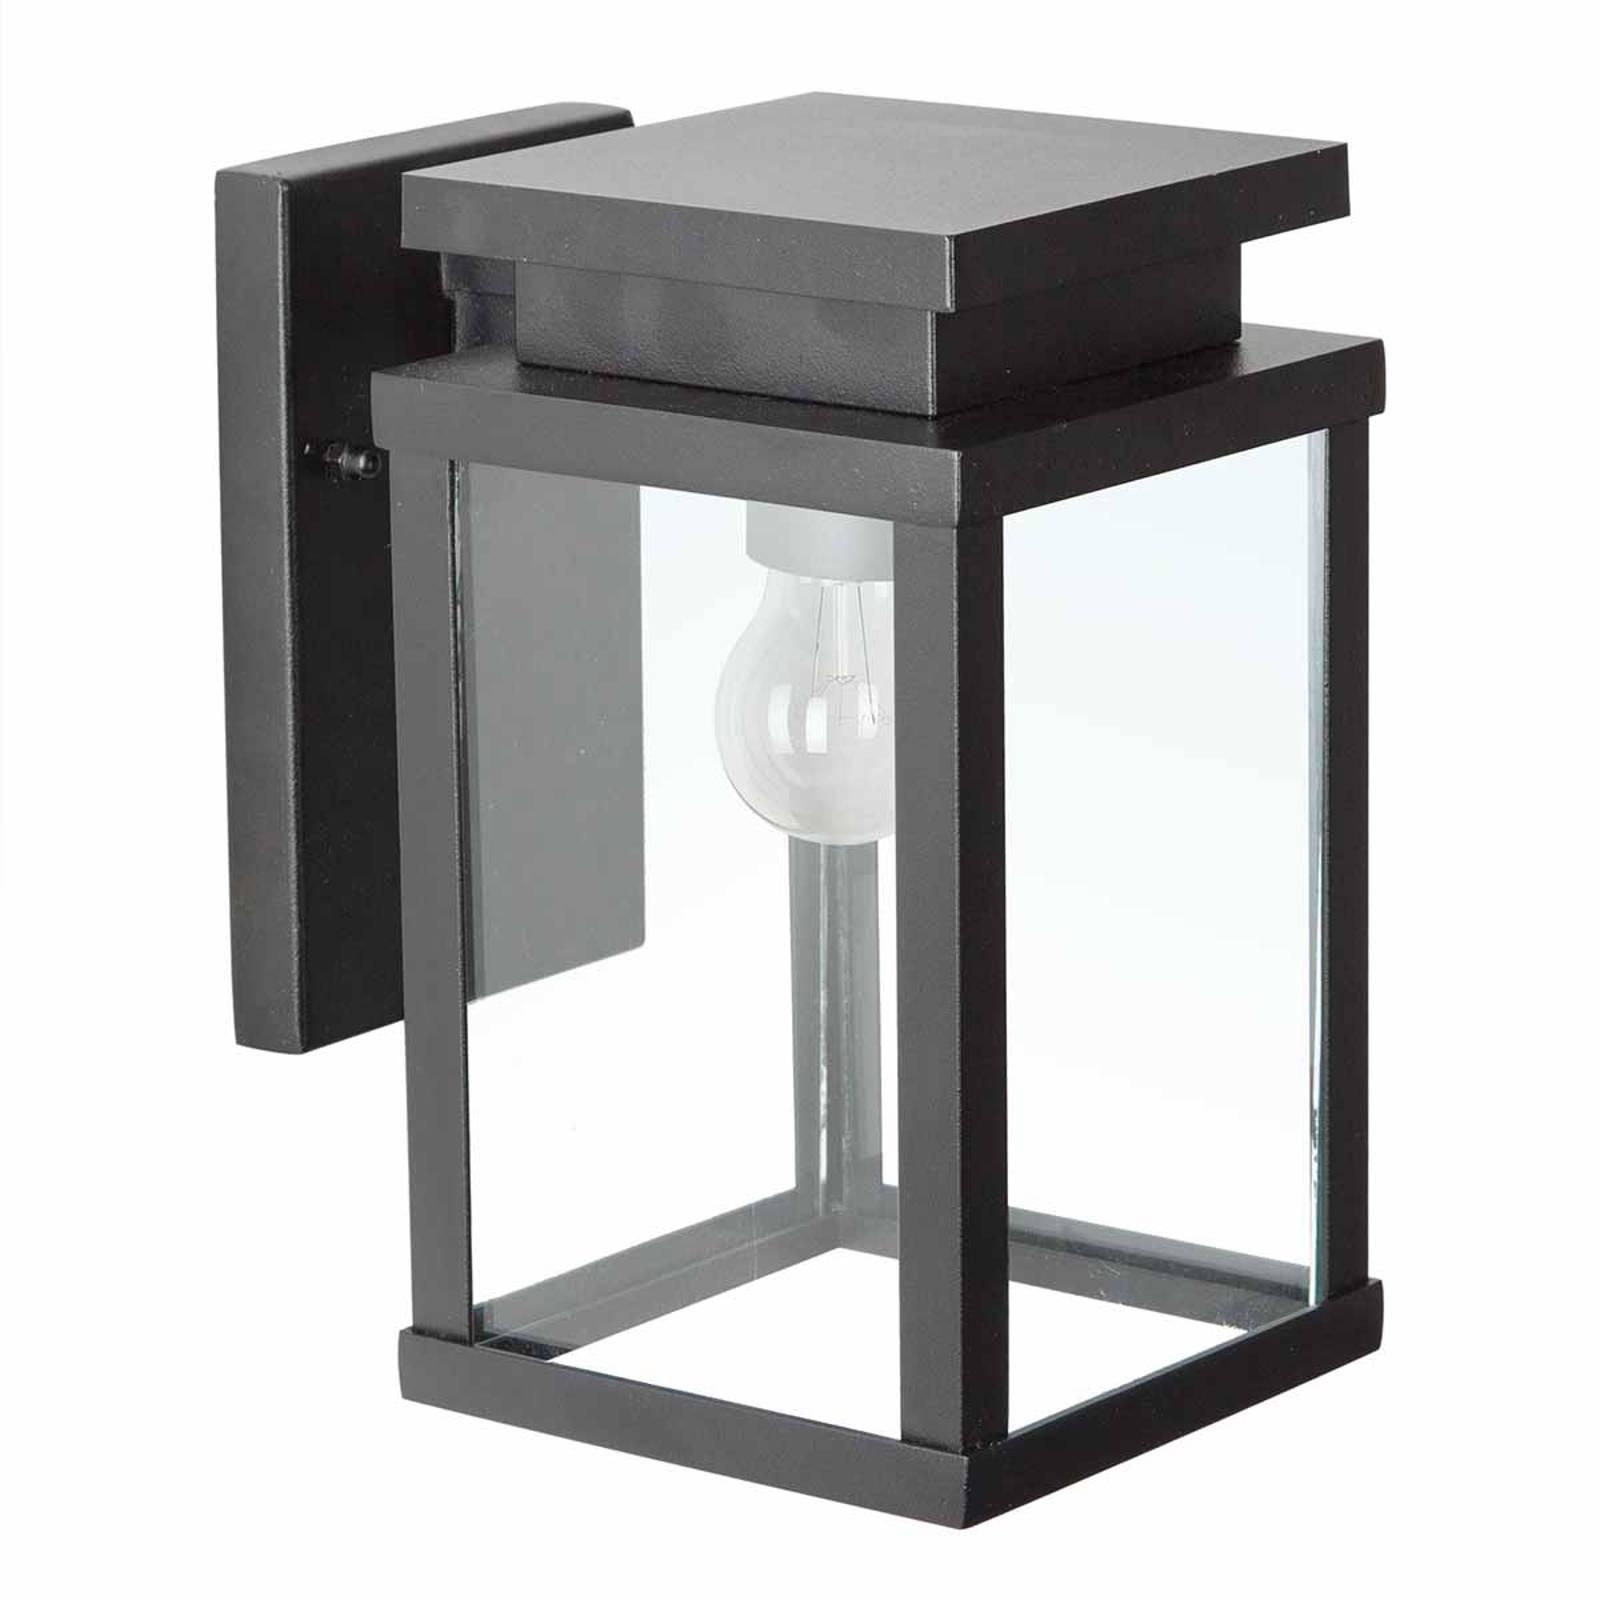 Buitenwandlamp Jersey M, hoogte 22 cm